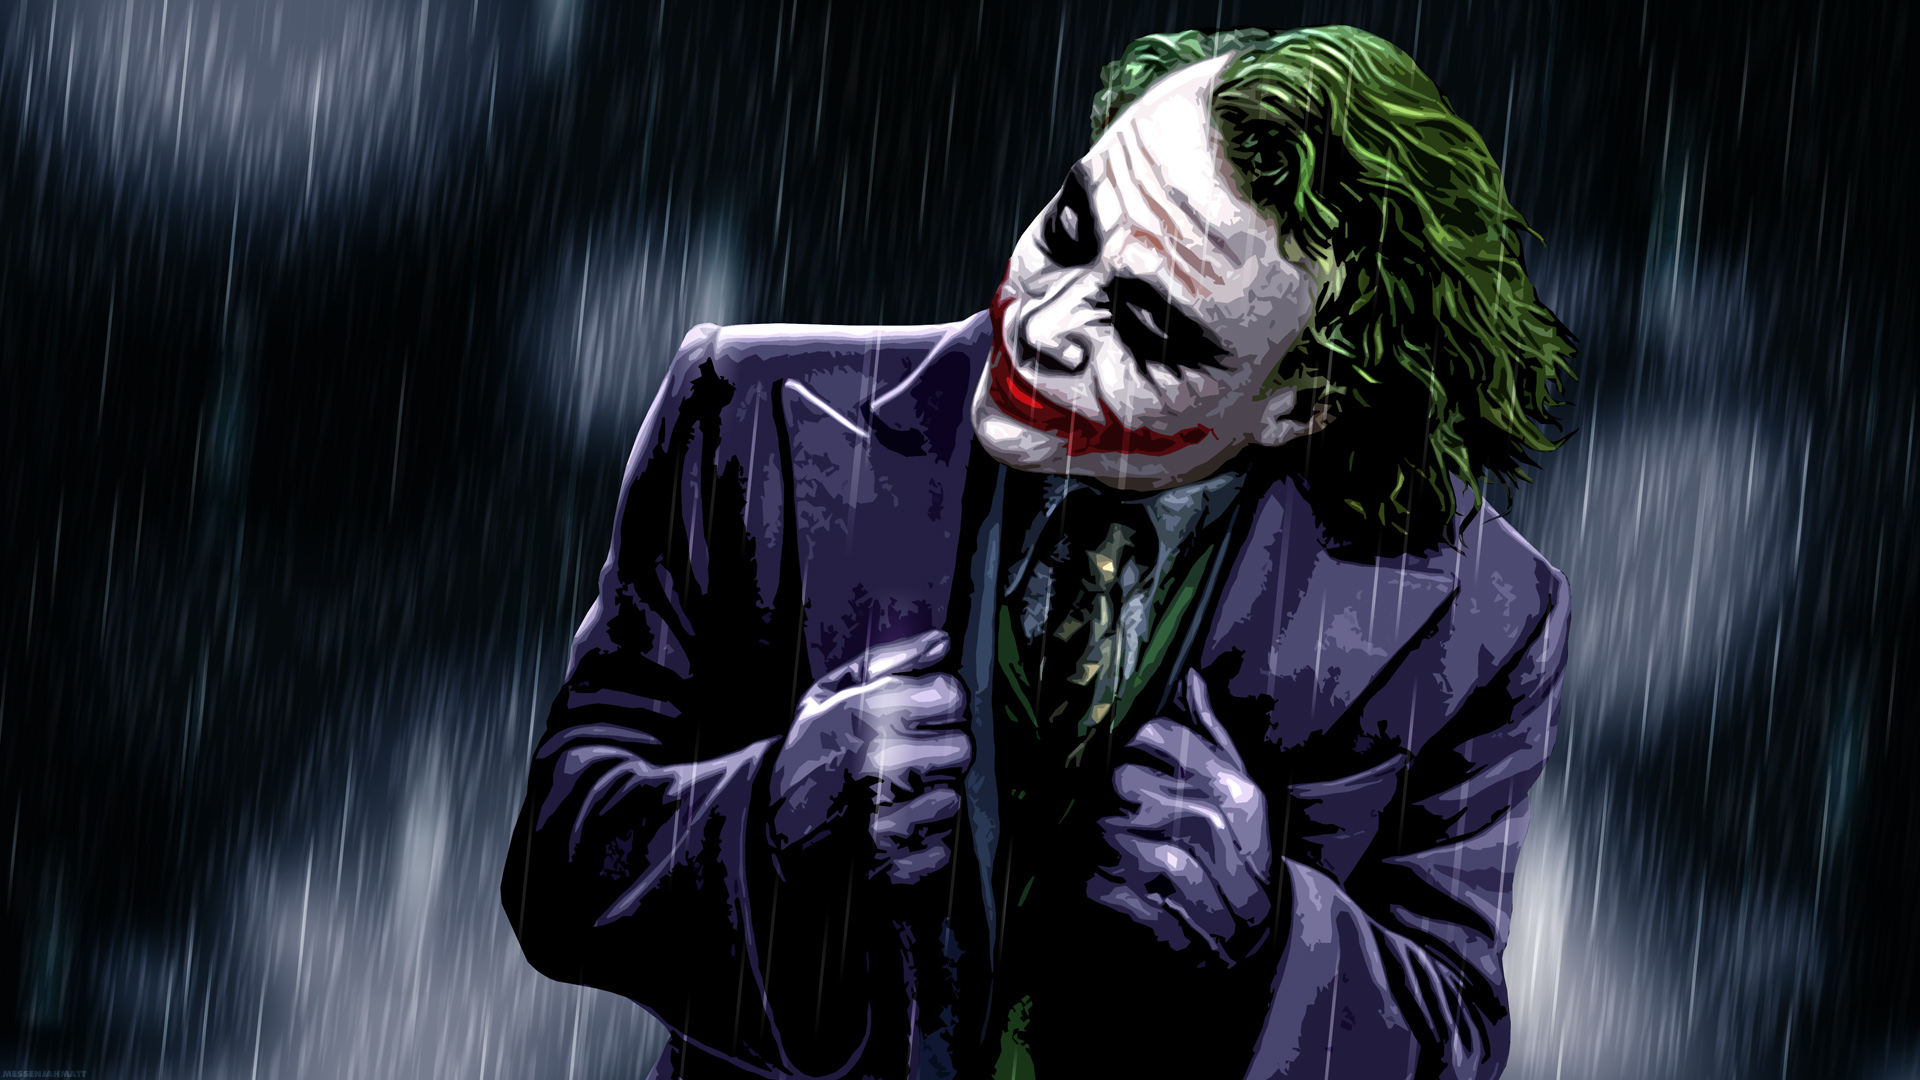 The Joker The Dark Knight Wallpaper 23437897 Fanpop 1920x1080